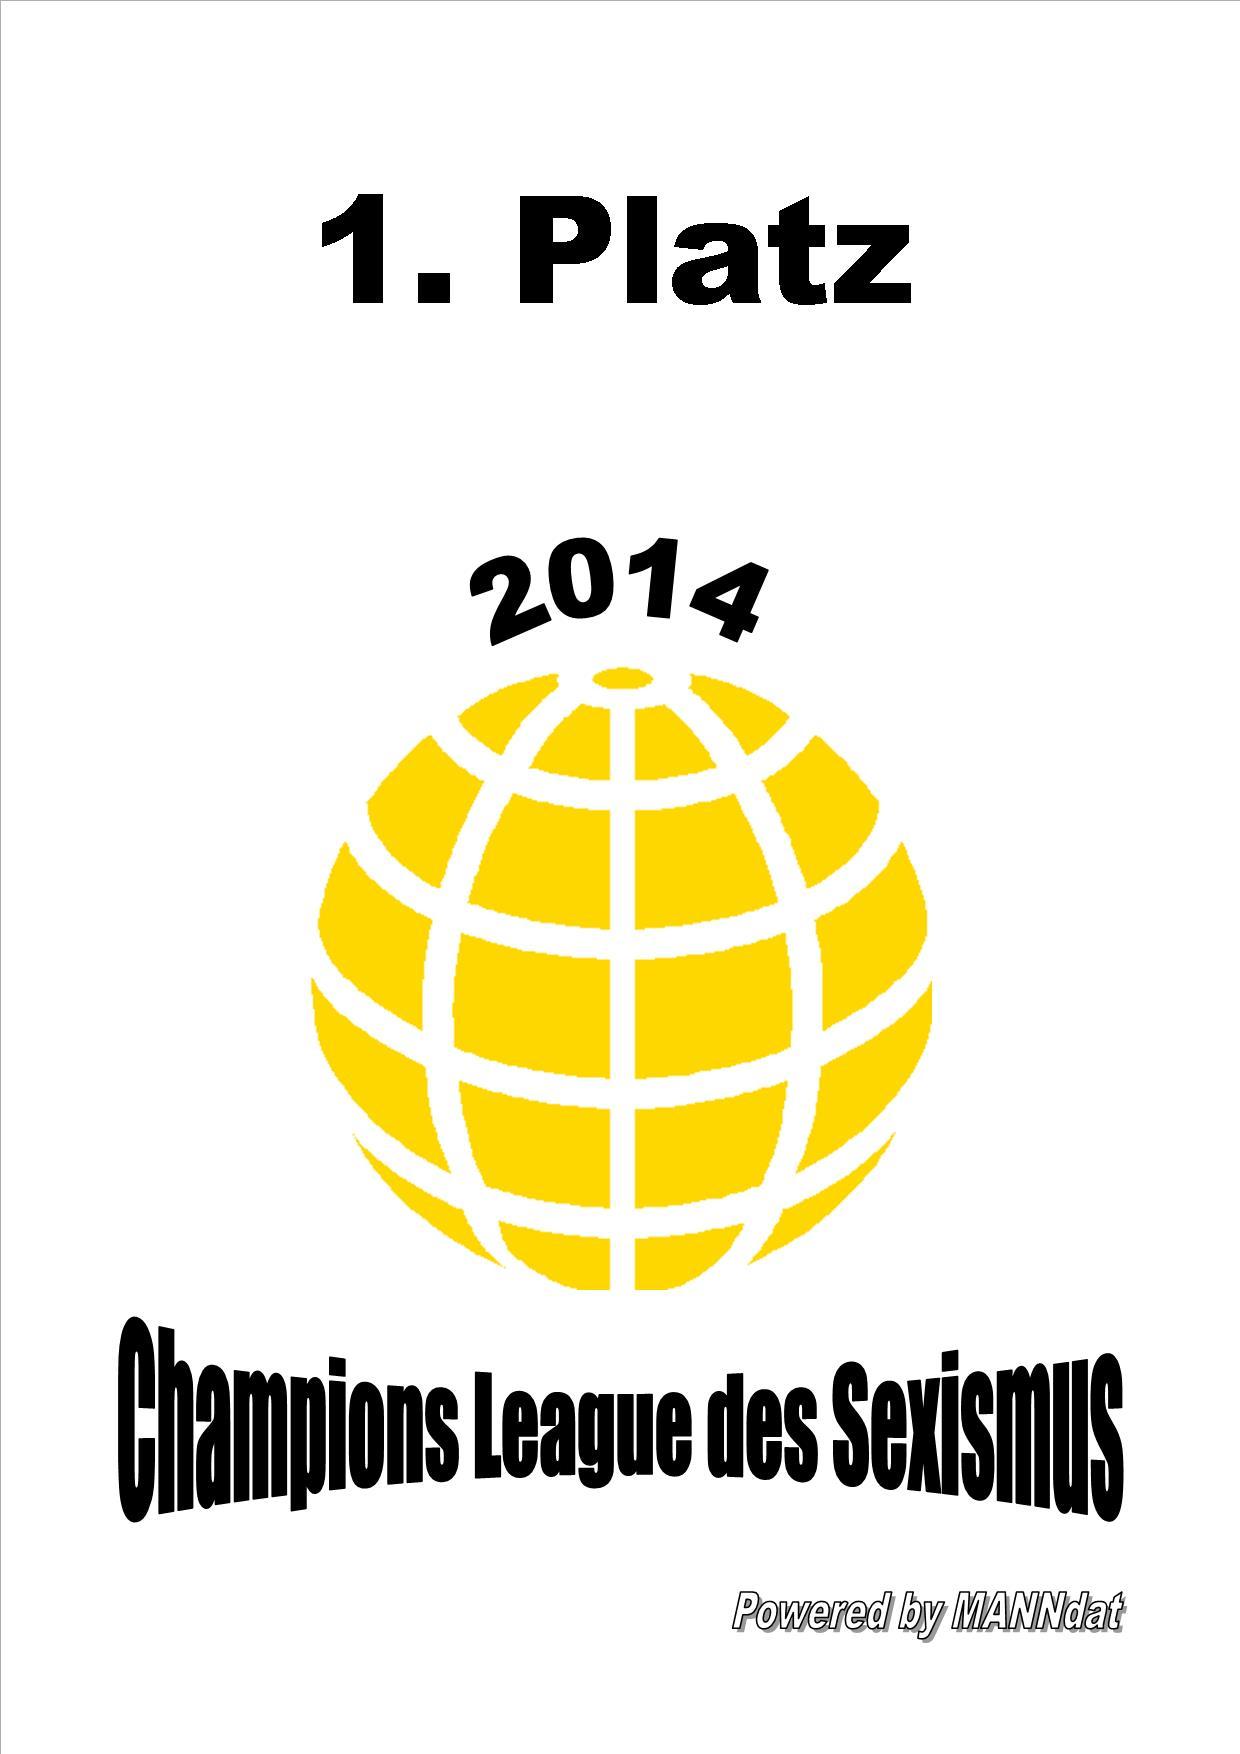 Sieger der Champions League des Sexismus: Das Frauenstatut der Grünen